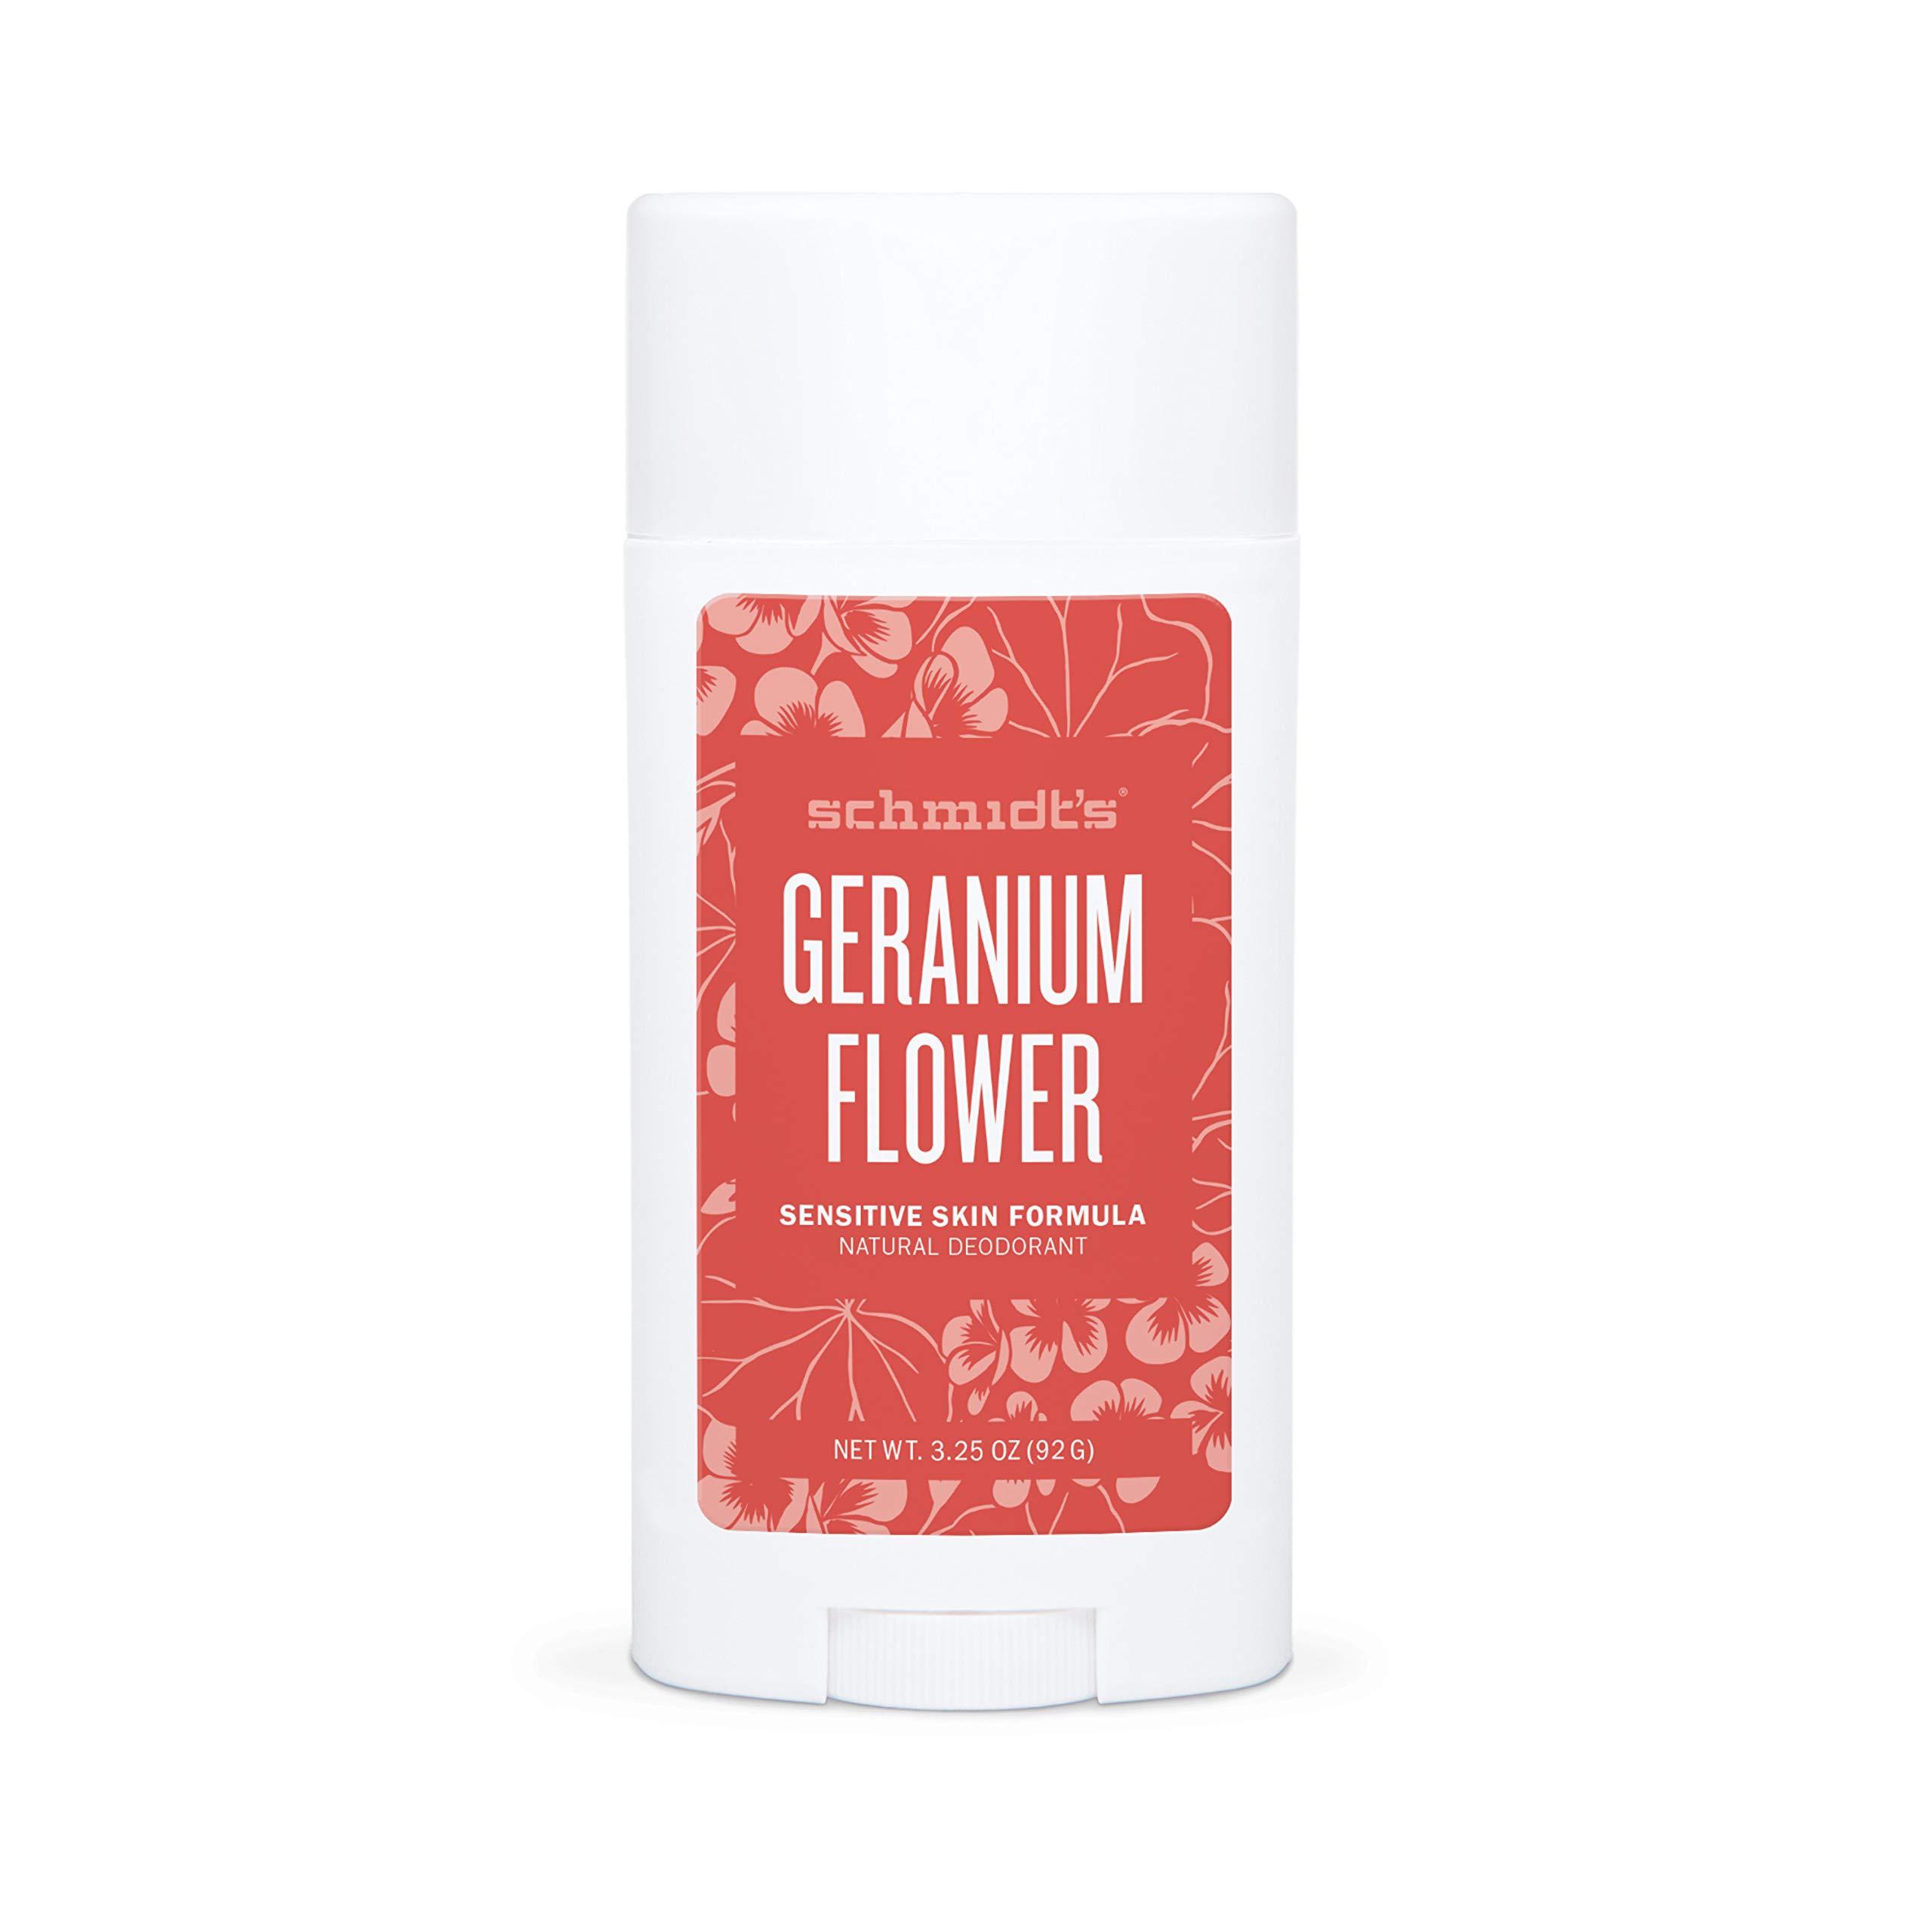 Schmidt's Aluminum Free Sensitive Skin Baking Soda-Free Natural Deodorant for Men and Women, 24 Hour Odor Protection and Freshness Geranium Flower Vegan, Certified Cruelty Free 3.25 OZ